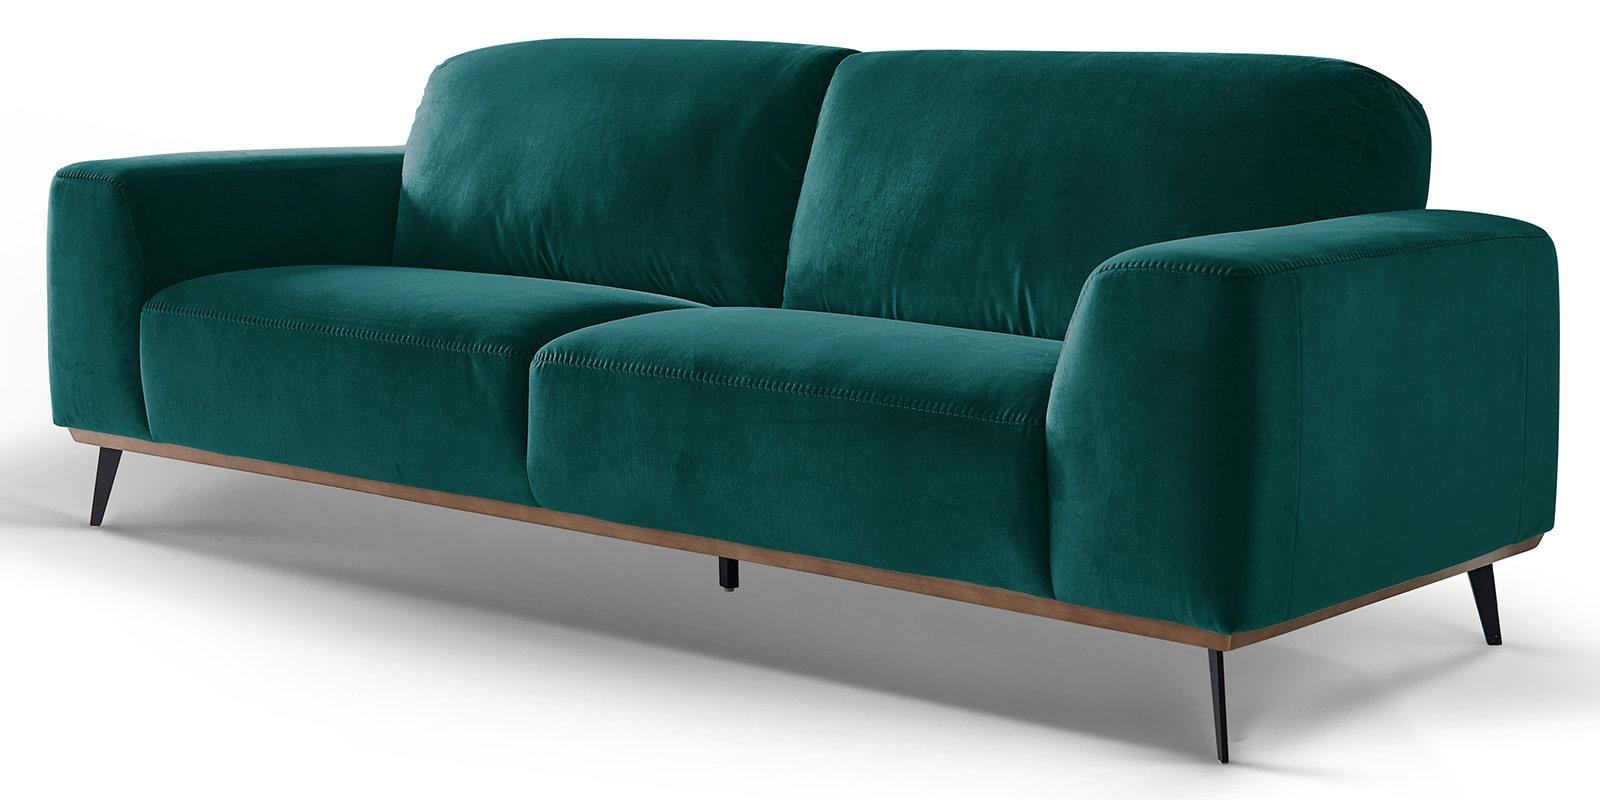 Moebella24 - 3-Sitzer - Sofa - Barcelona - Samt - Petrol - Skandinavisches - Design - Punto - cavallo - Nähte - Detailaufnahme